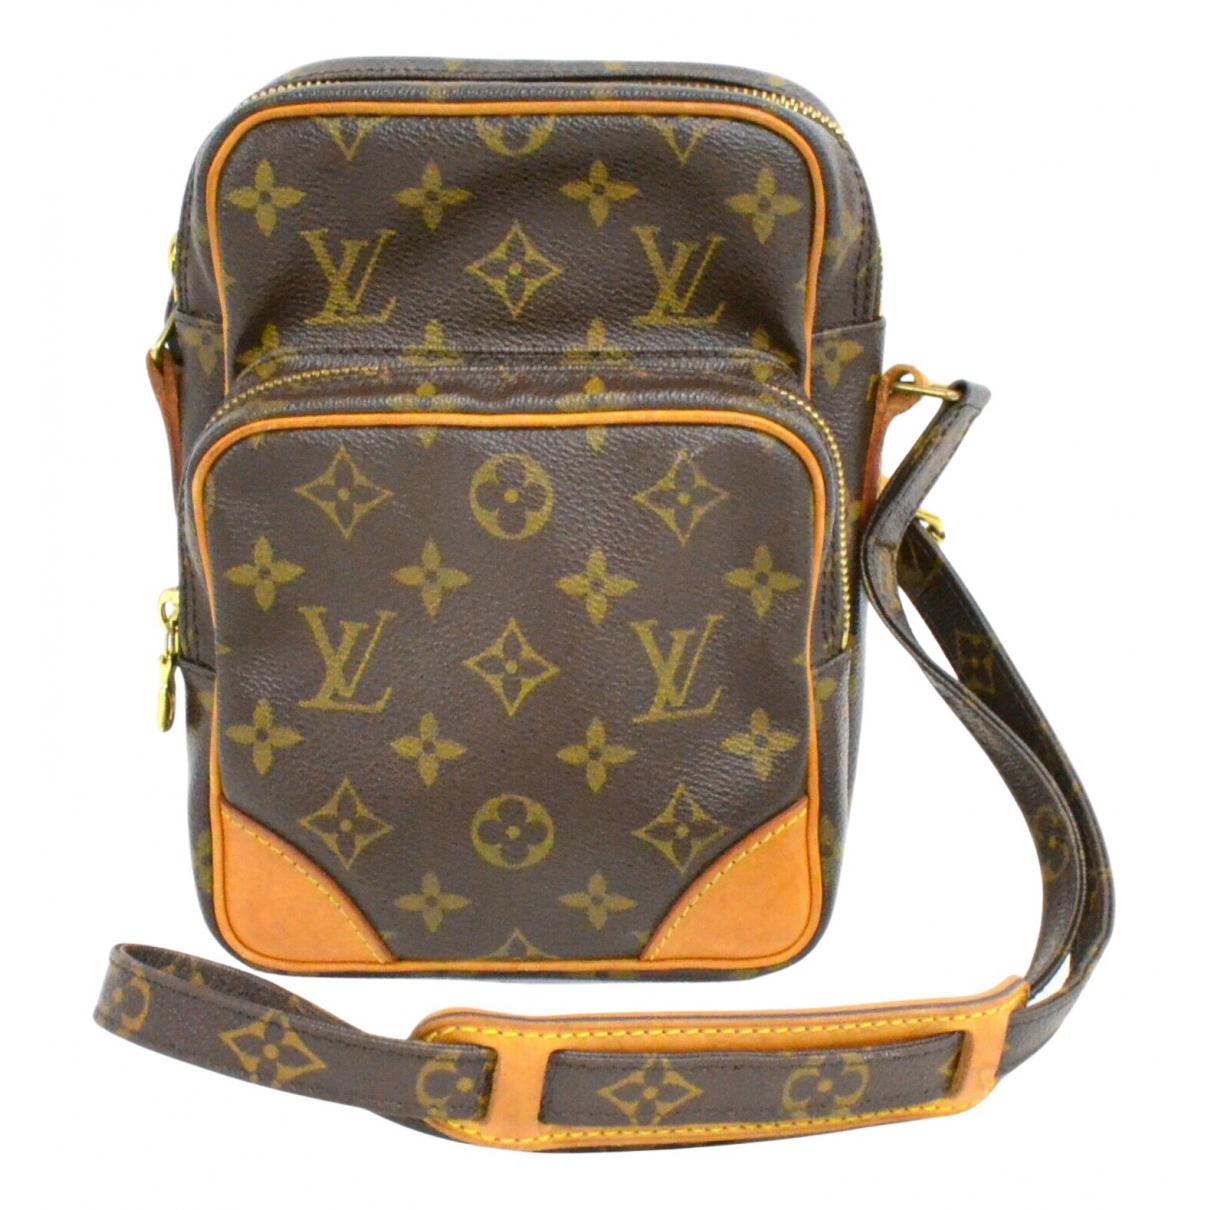 Bandolera Amazon de Lona Louis Vuitton